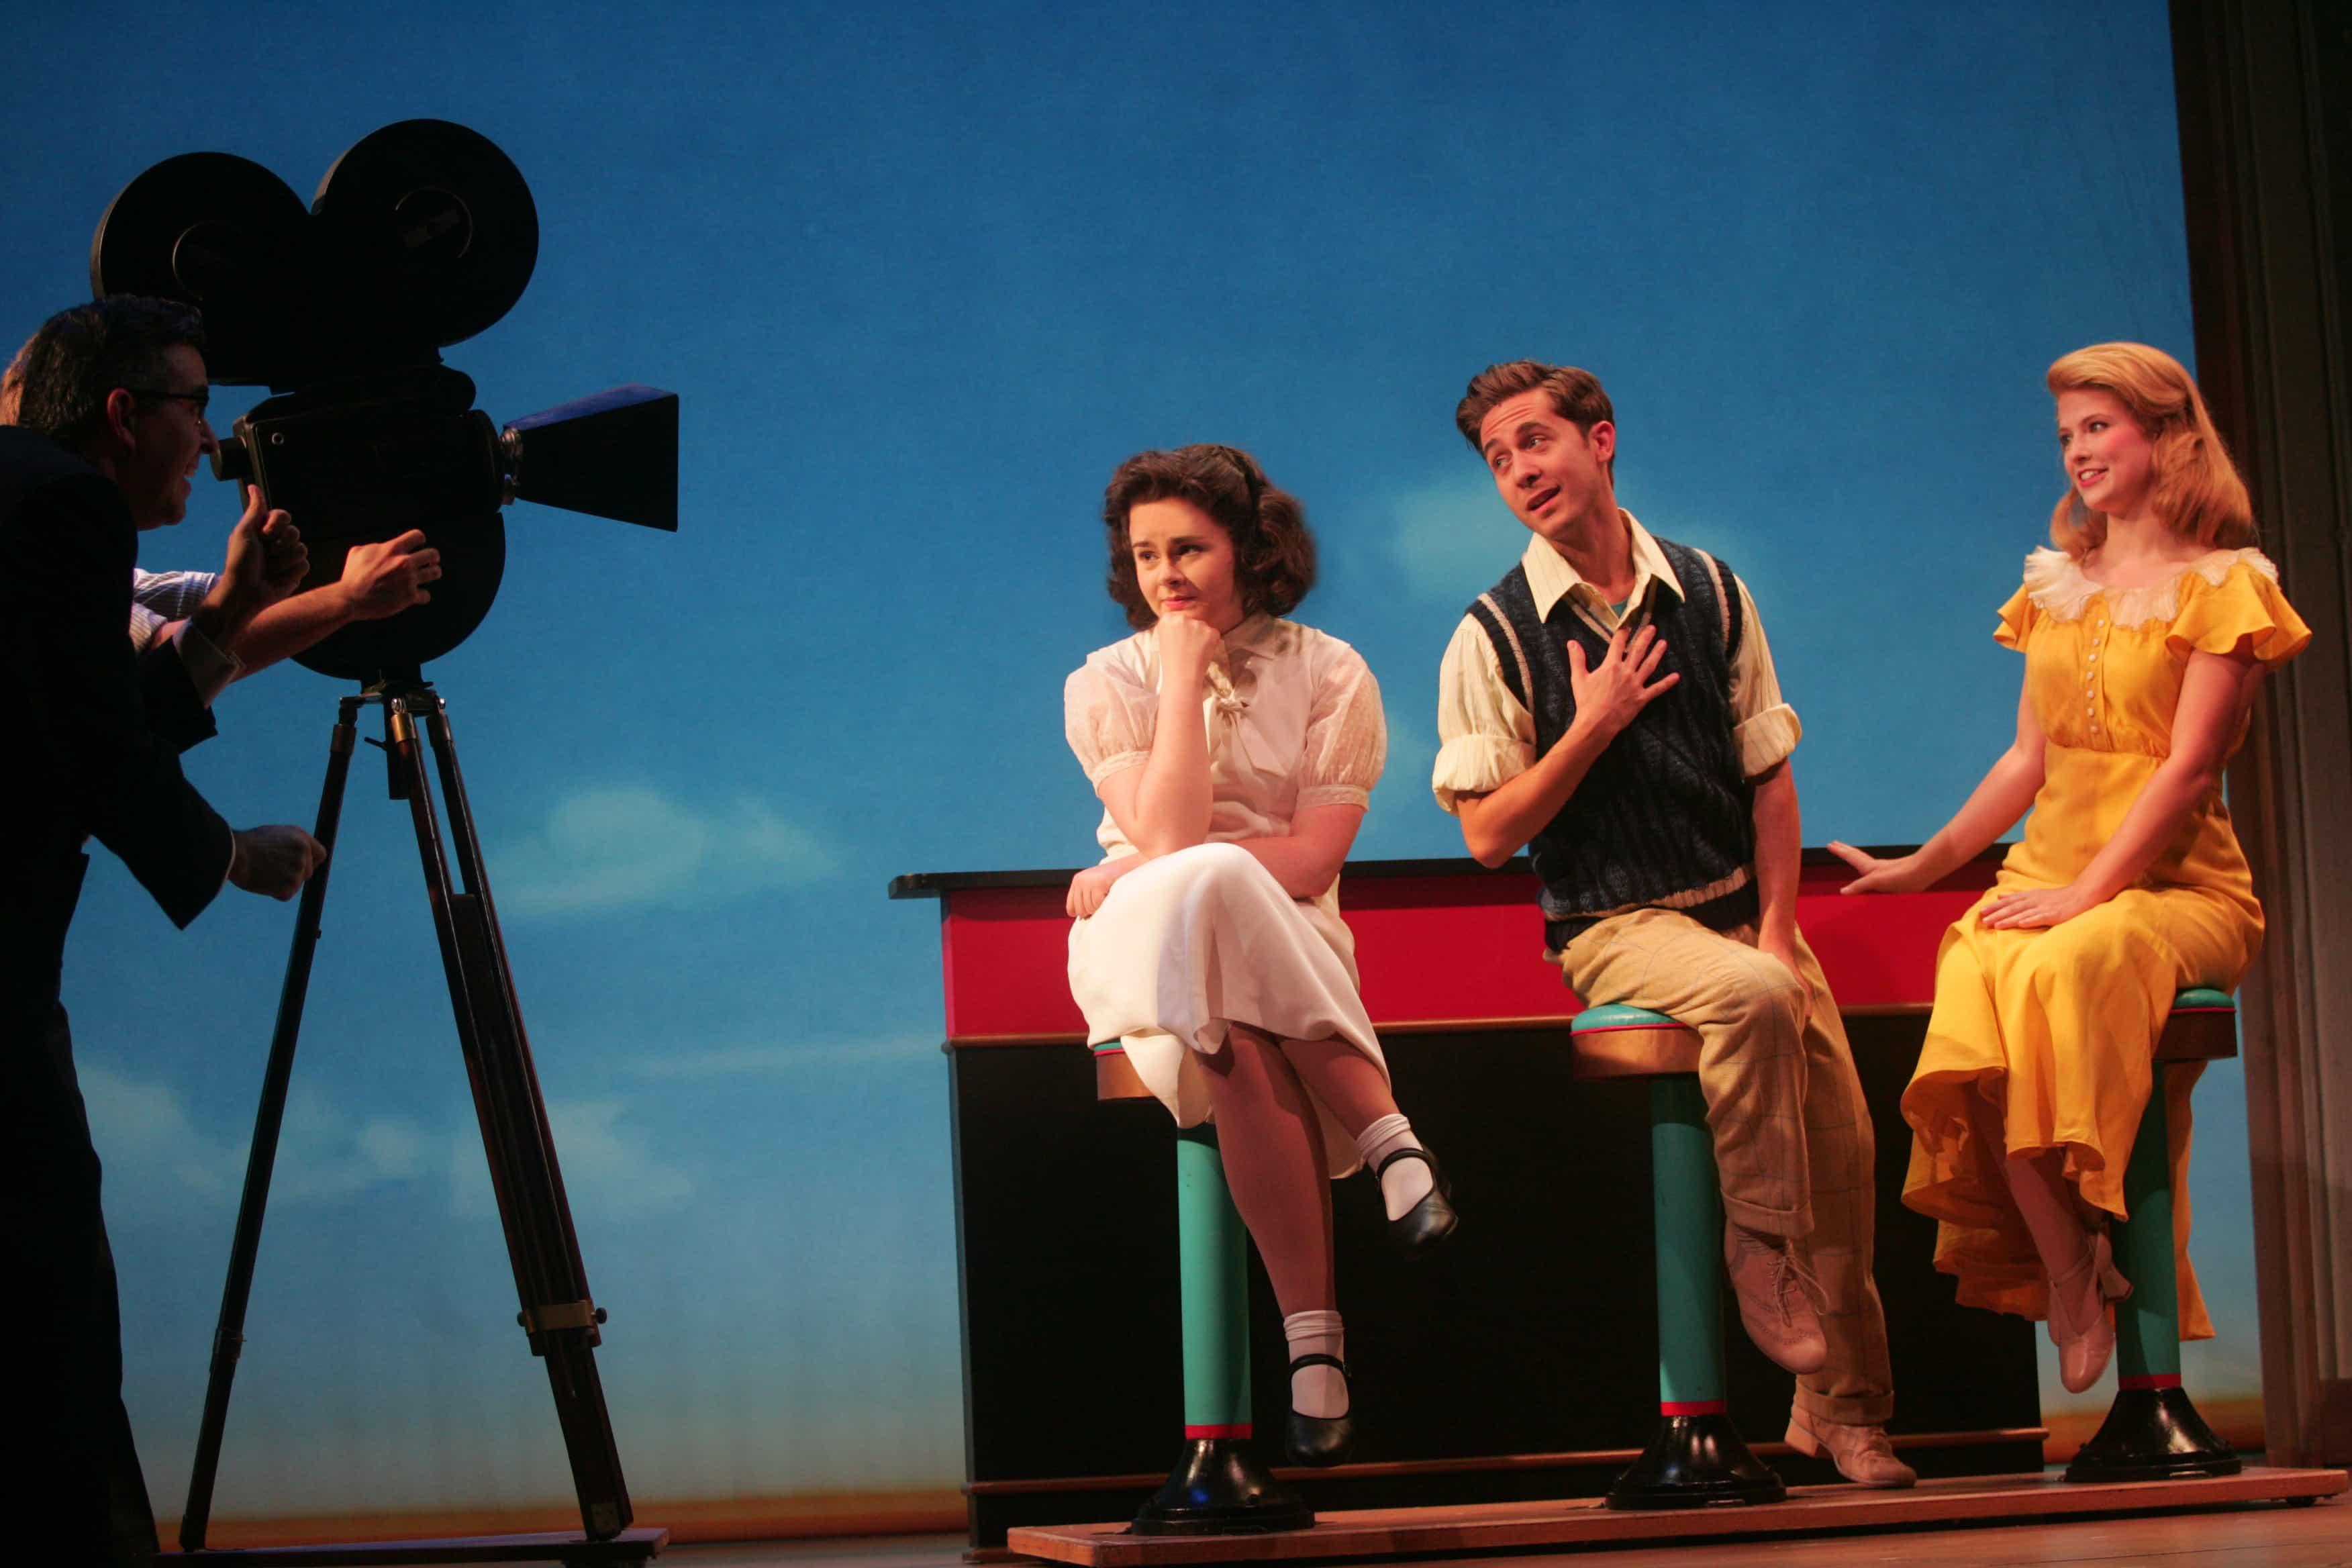 Ruby Rakos as Judy Garland, Michael Wartella as Mickey Rooney, and Berklea Going as Lana Turner in Chasing Rainbows: The Road to Oz.   Photo by Diane Sobolewski